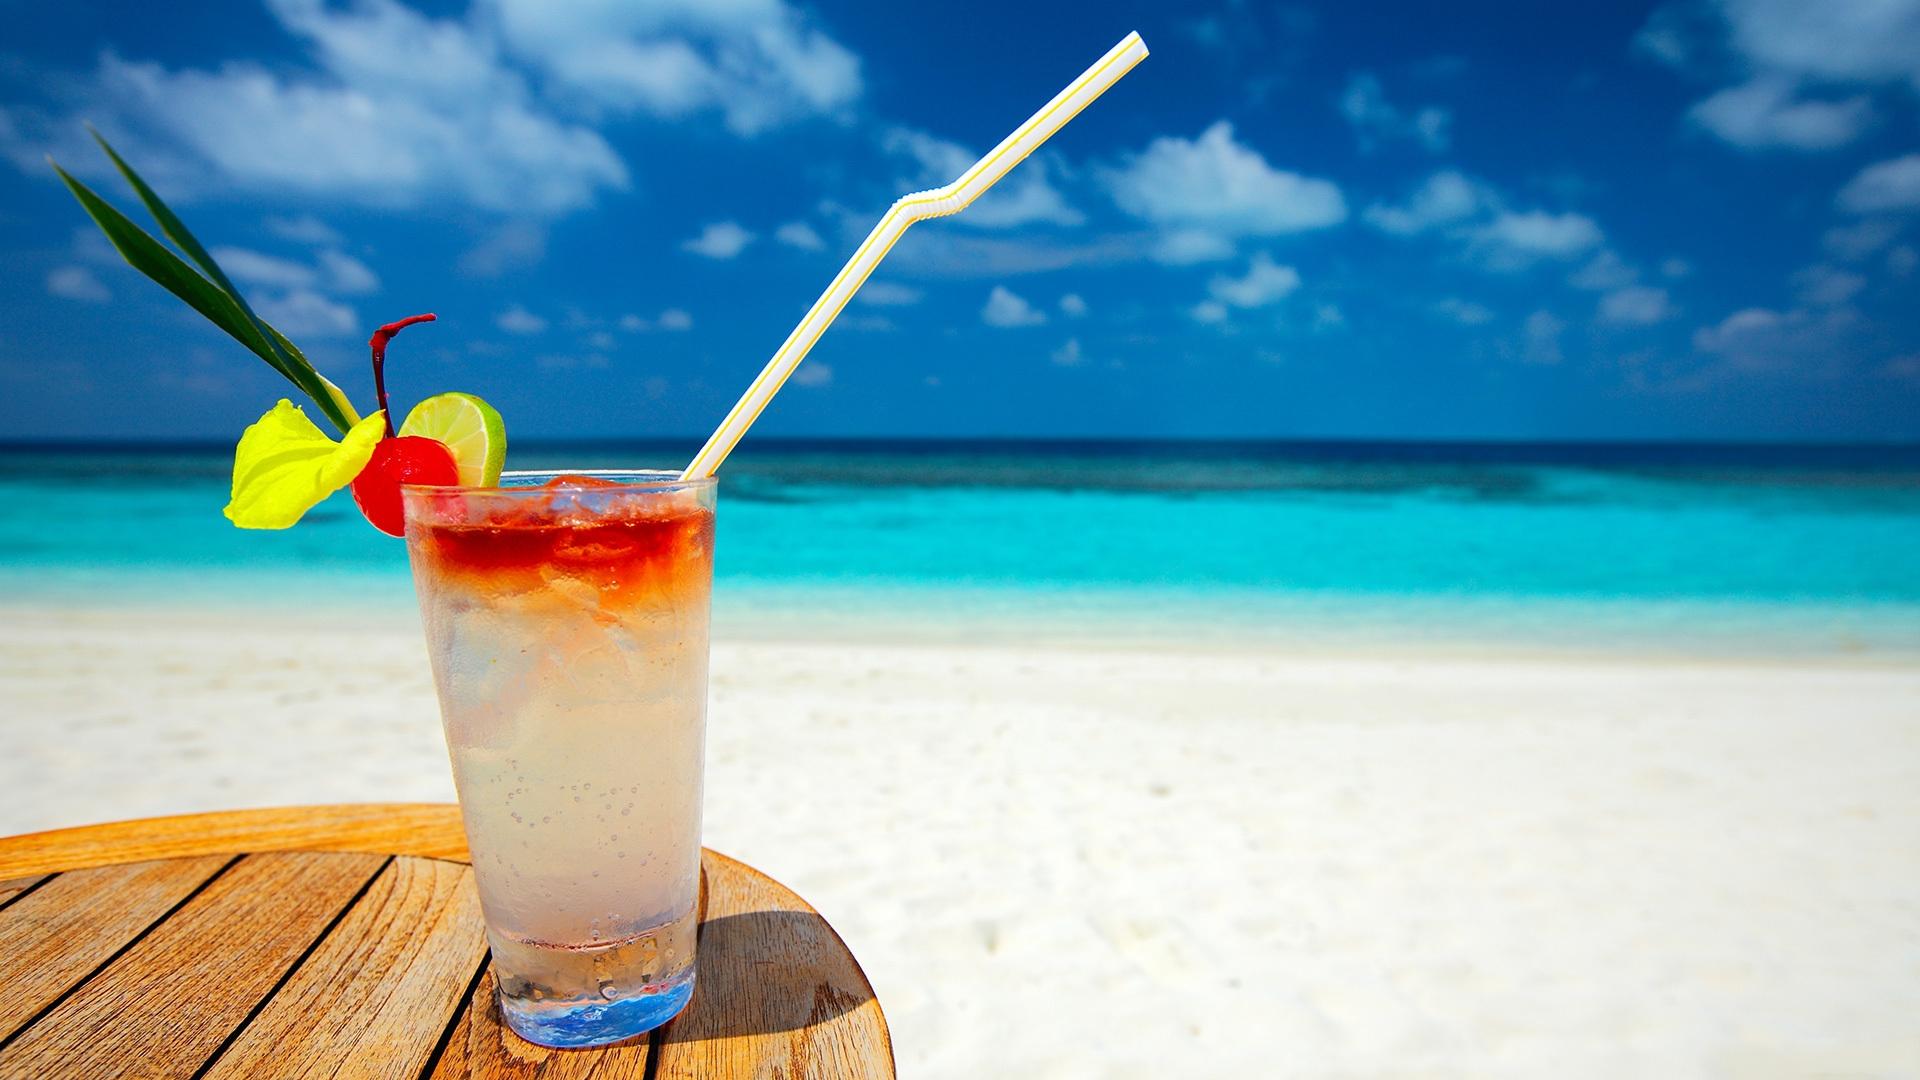 Hd Summer Desktop Backgrounds Pixelstalk  Ideas About - Cold Drinks On The Beach - HD Wallpaper